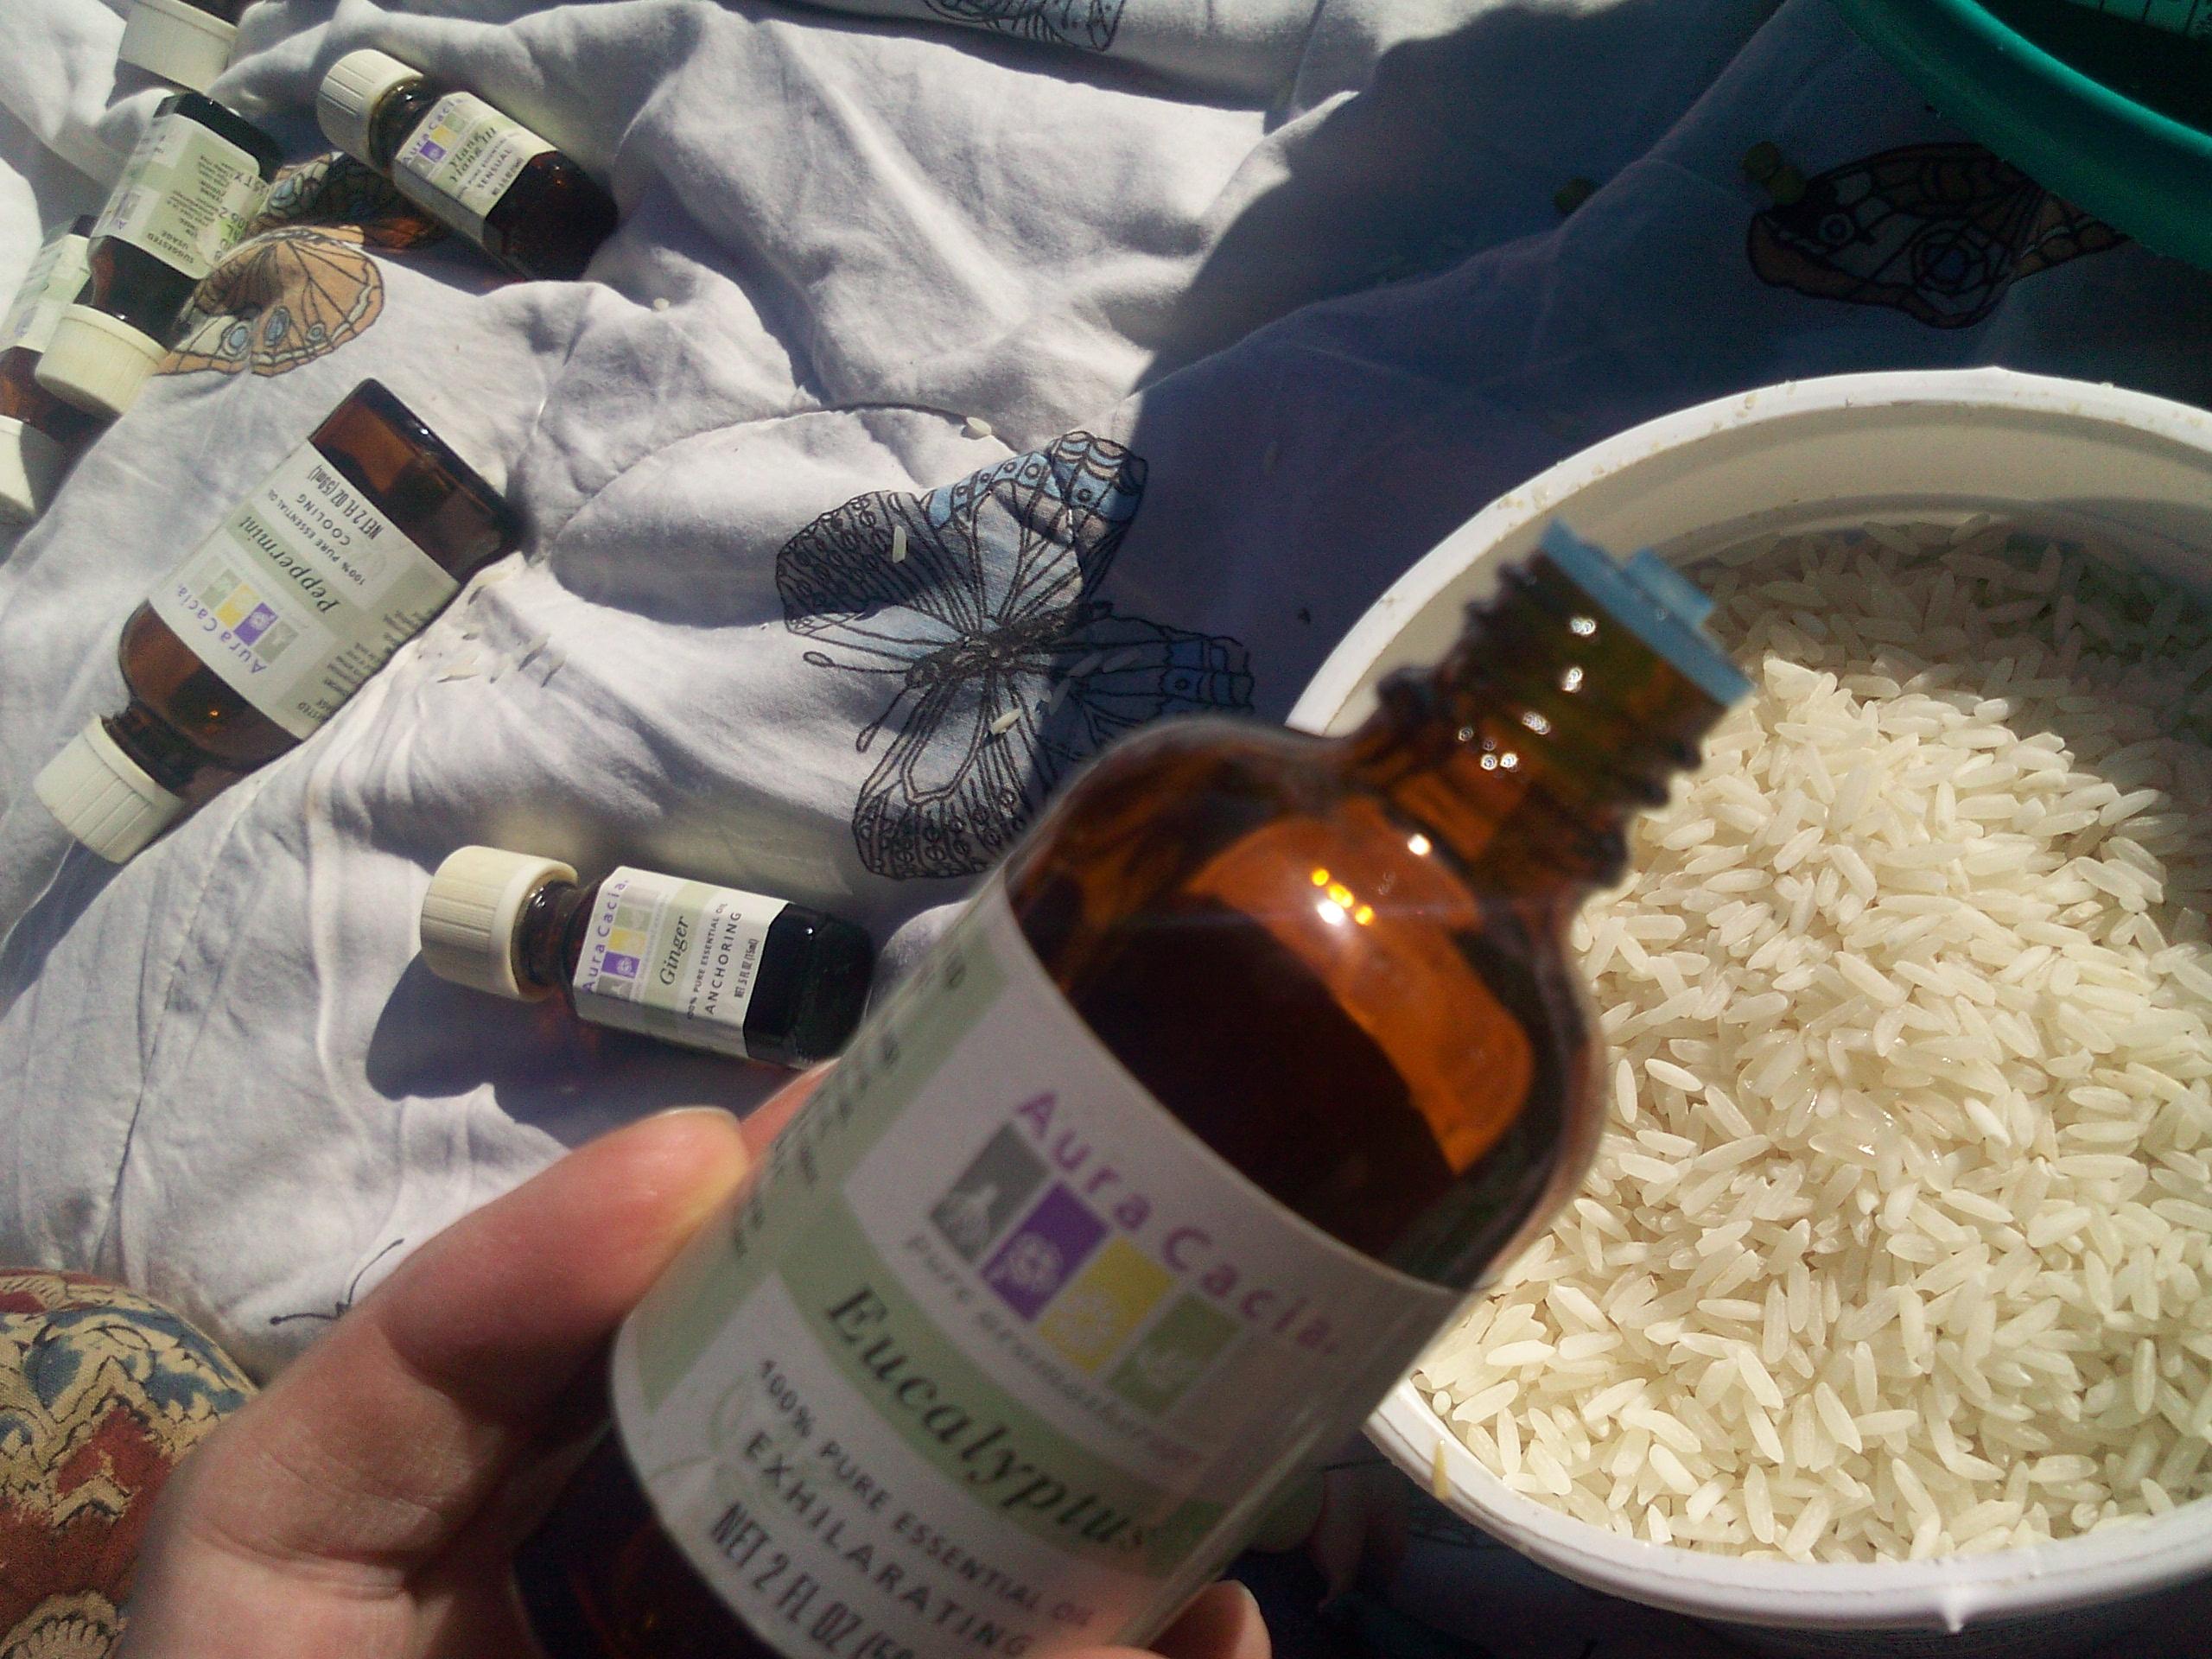 pouring-eucalyptus-into-rice